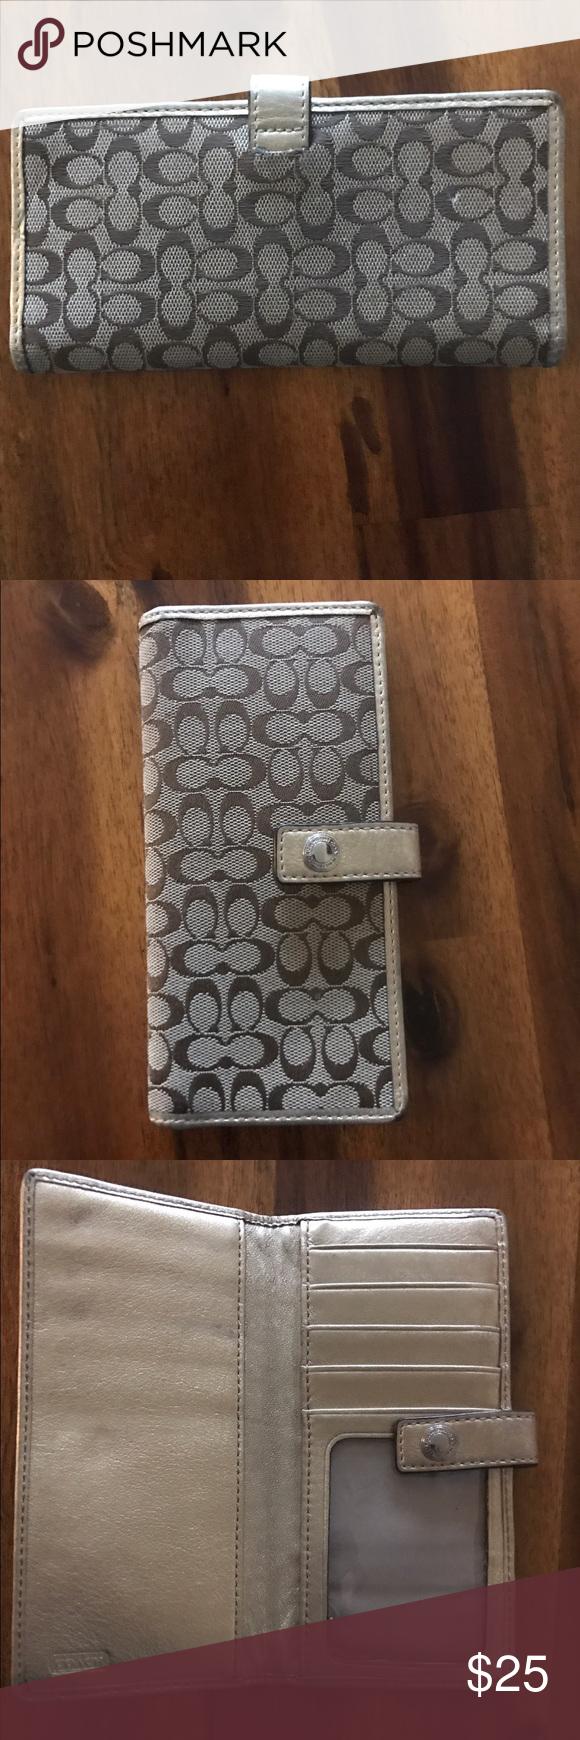 COACH wallet! Tan & Gold. COACH wallet, tan and gold monogram/trim. Very little wear. No holes. Coach Bags Wallets